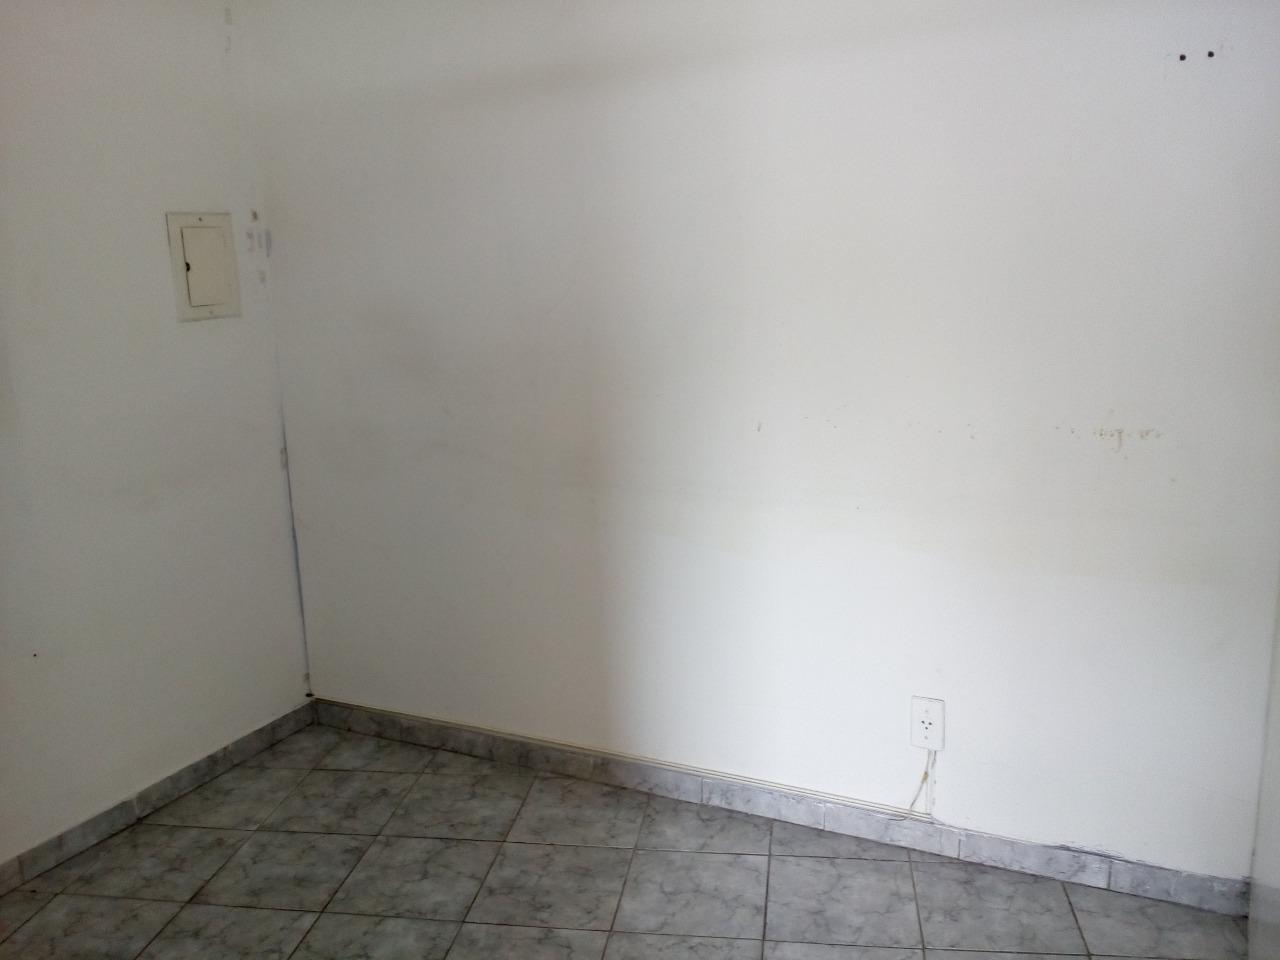 Estoril, Loja à venda , 43,00m²